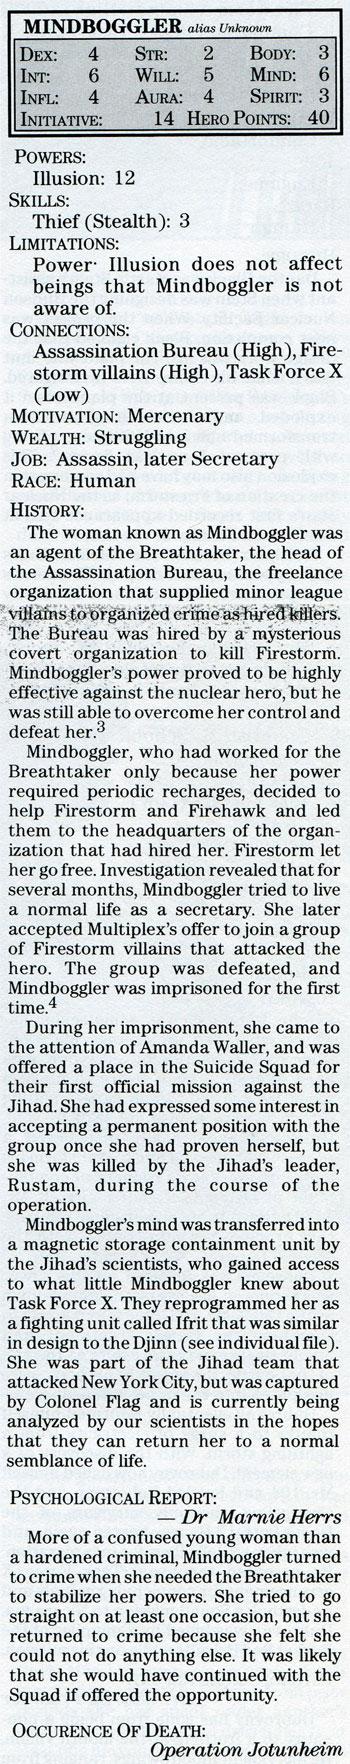 Mindboggler Mayfair DC Heroes RPG statistics 1988